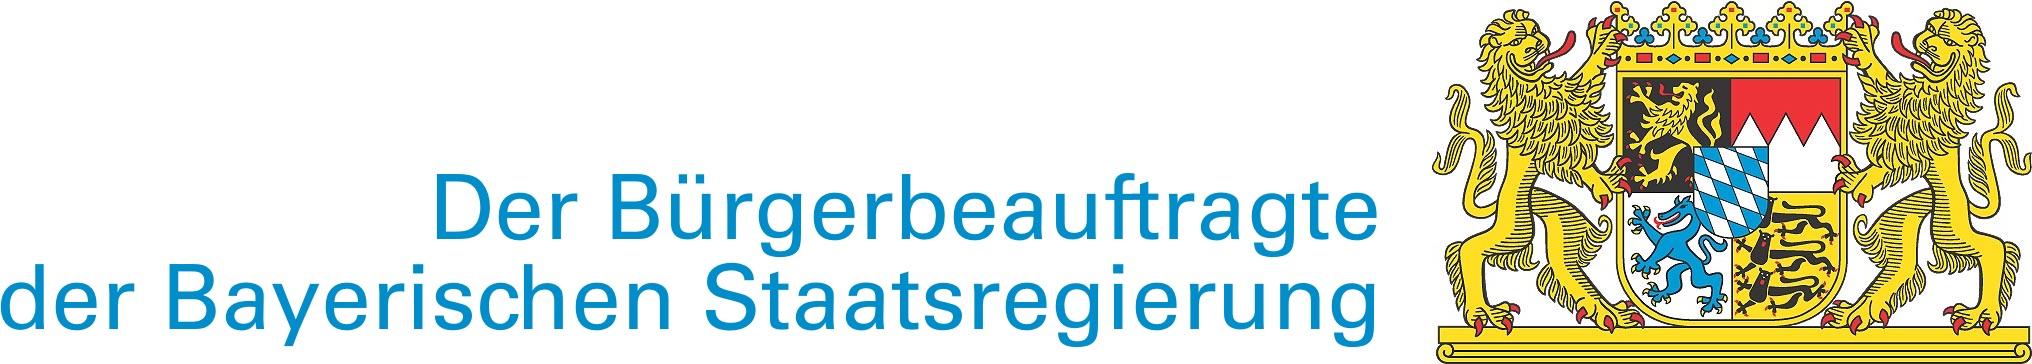 Bürgerbeauftragter der Bayerischen Staatsregierung